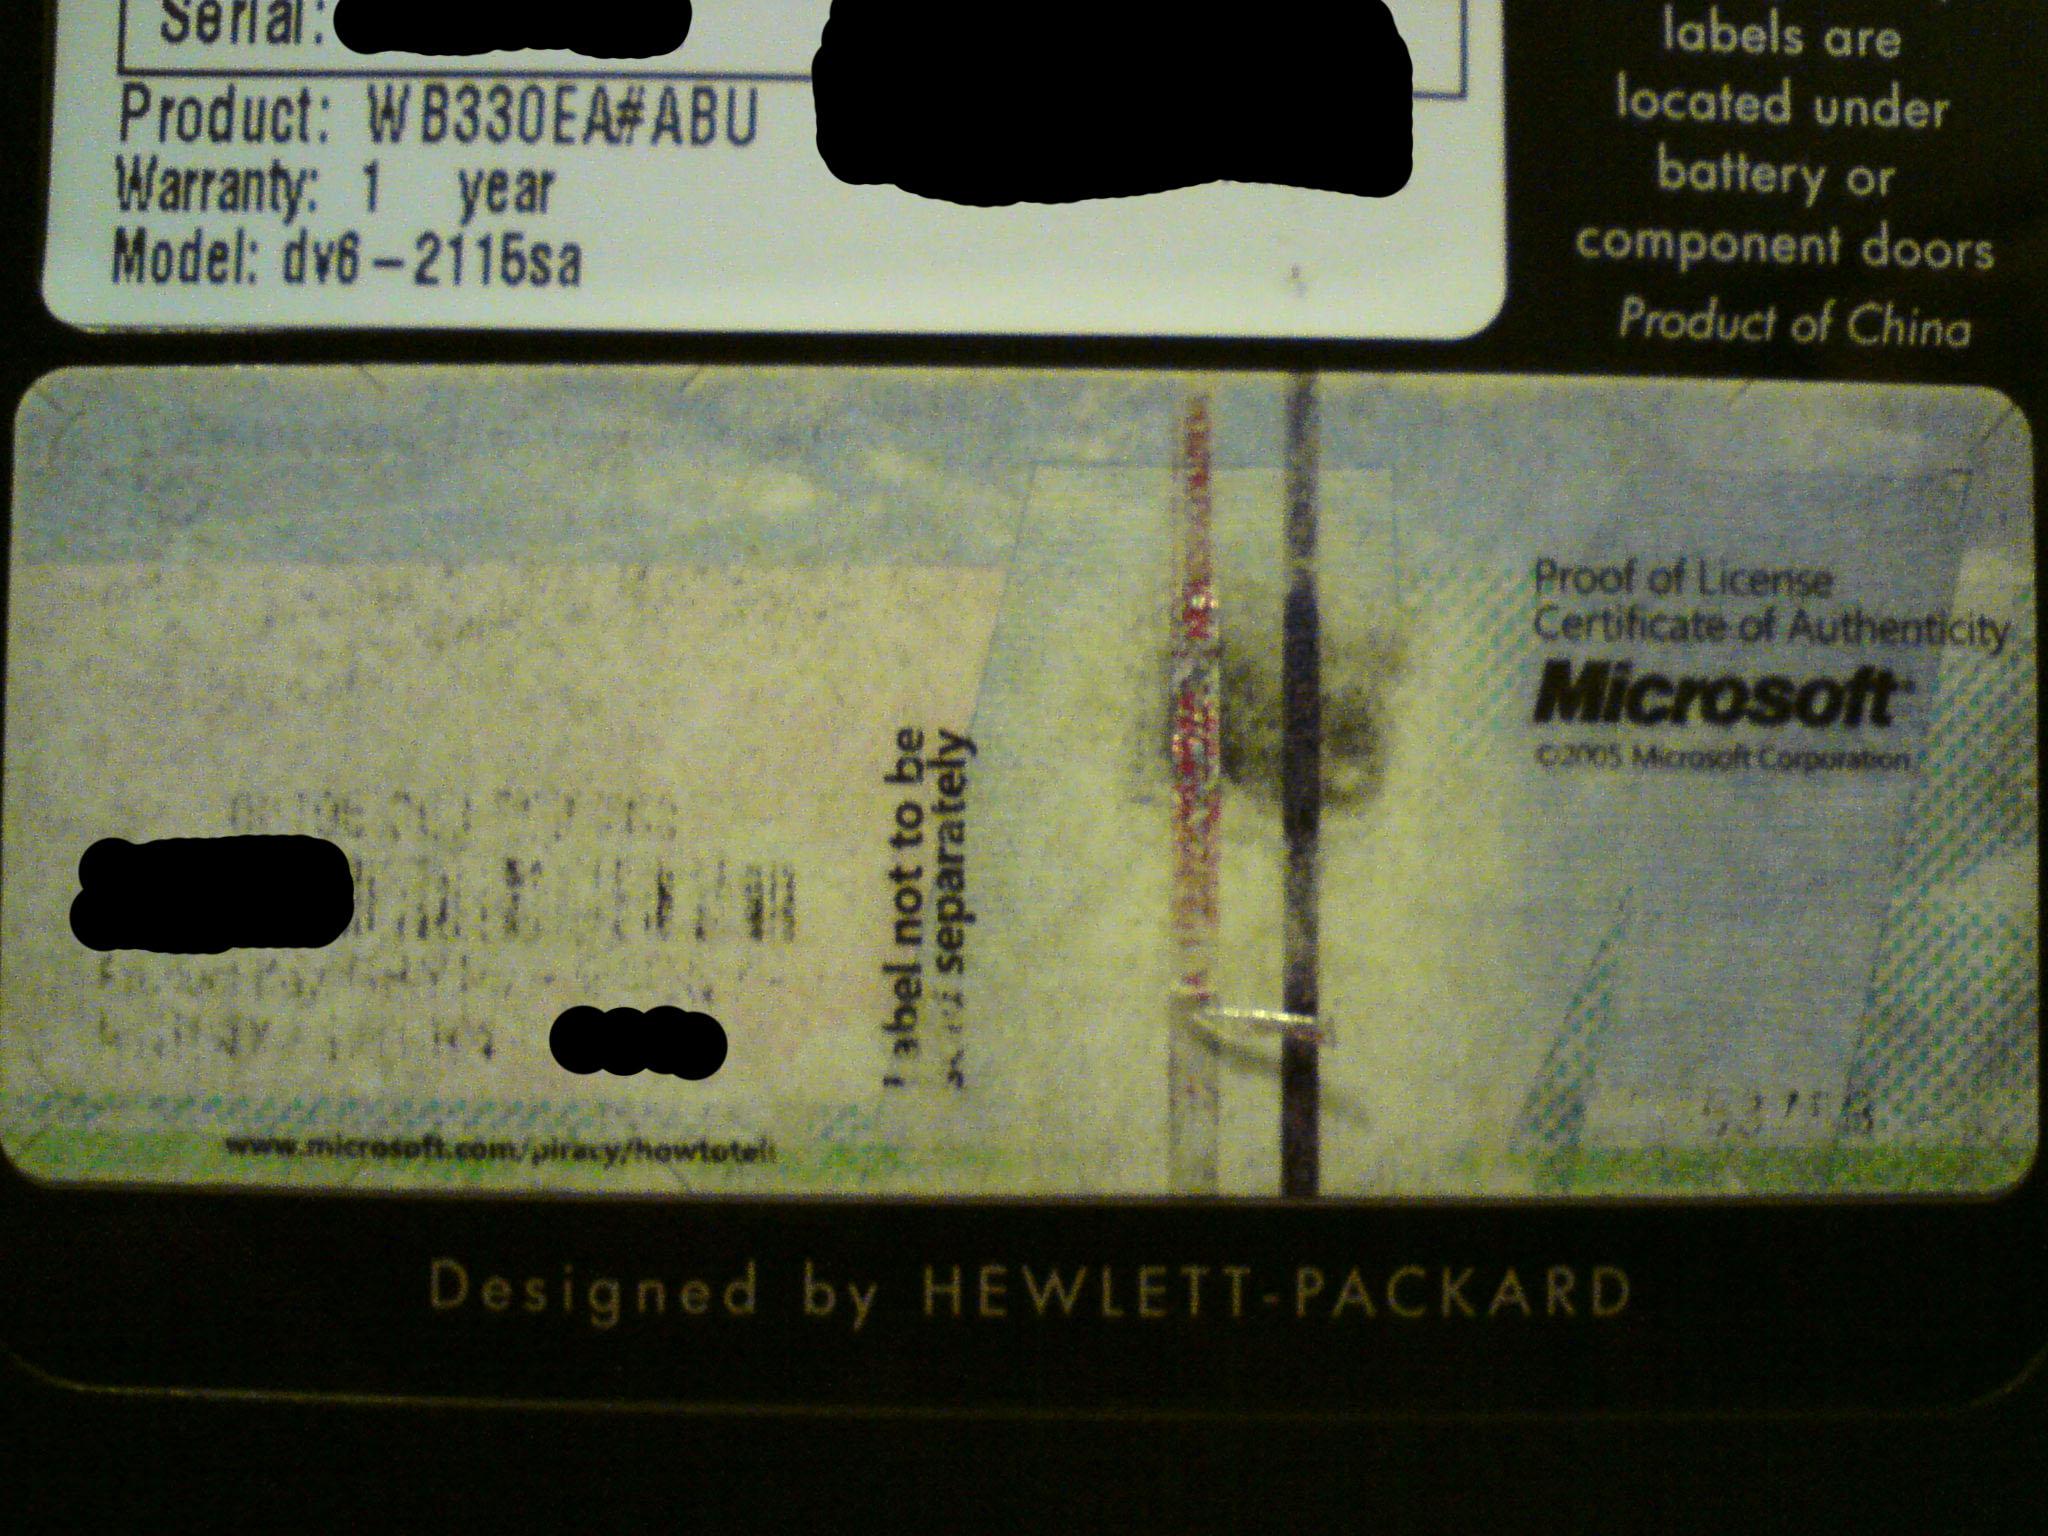 Windows 7 certificate of authenticity